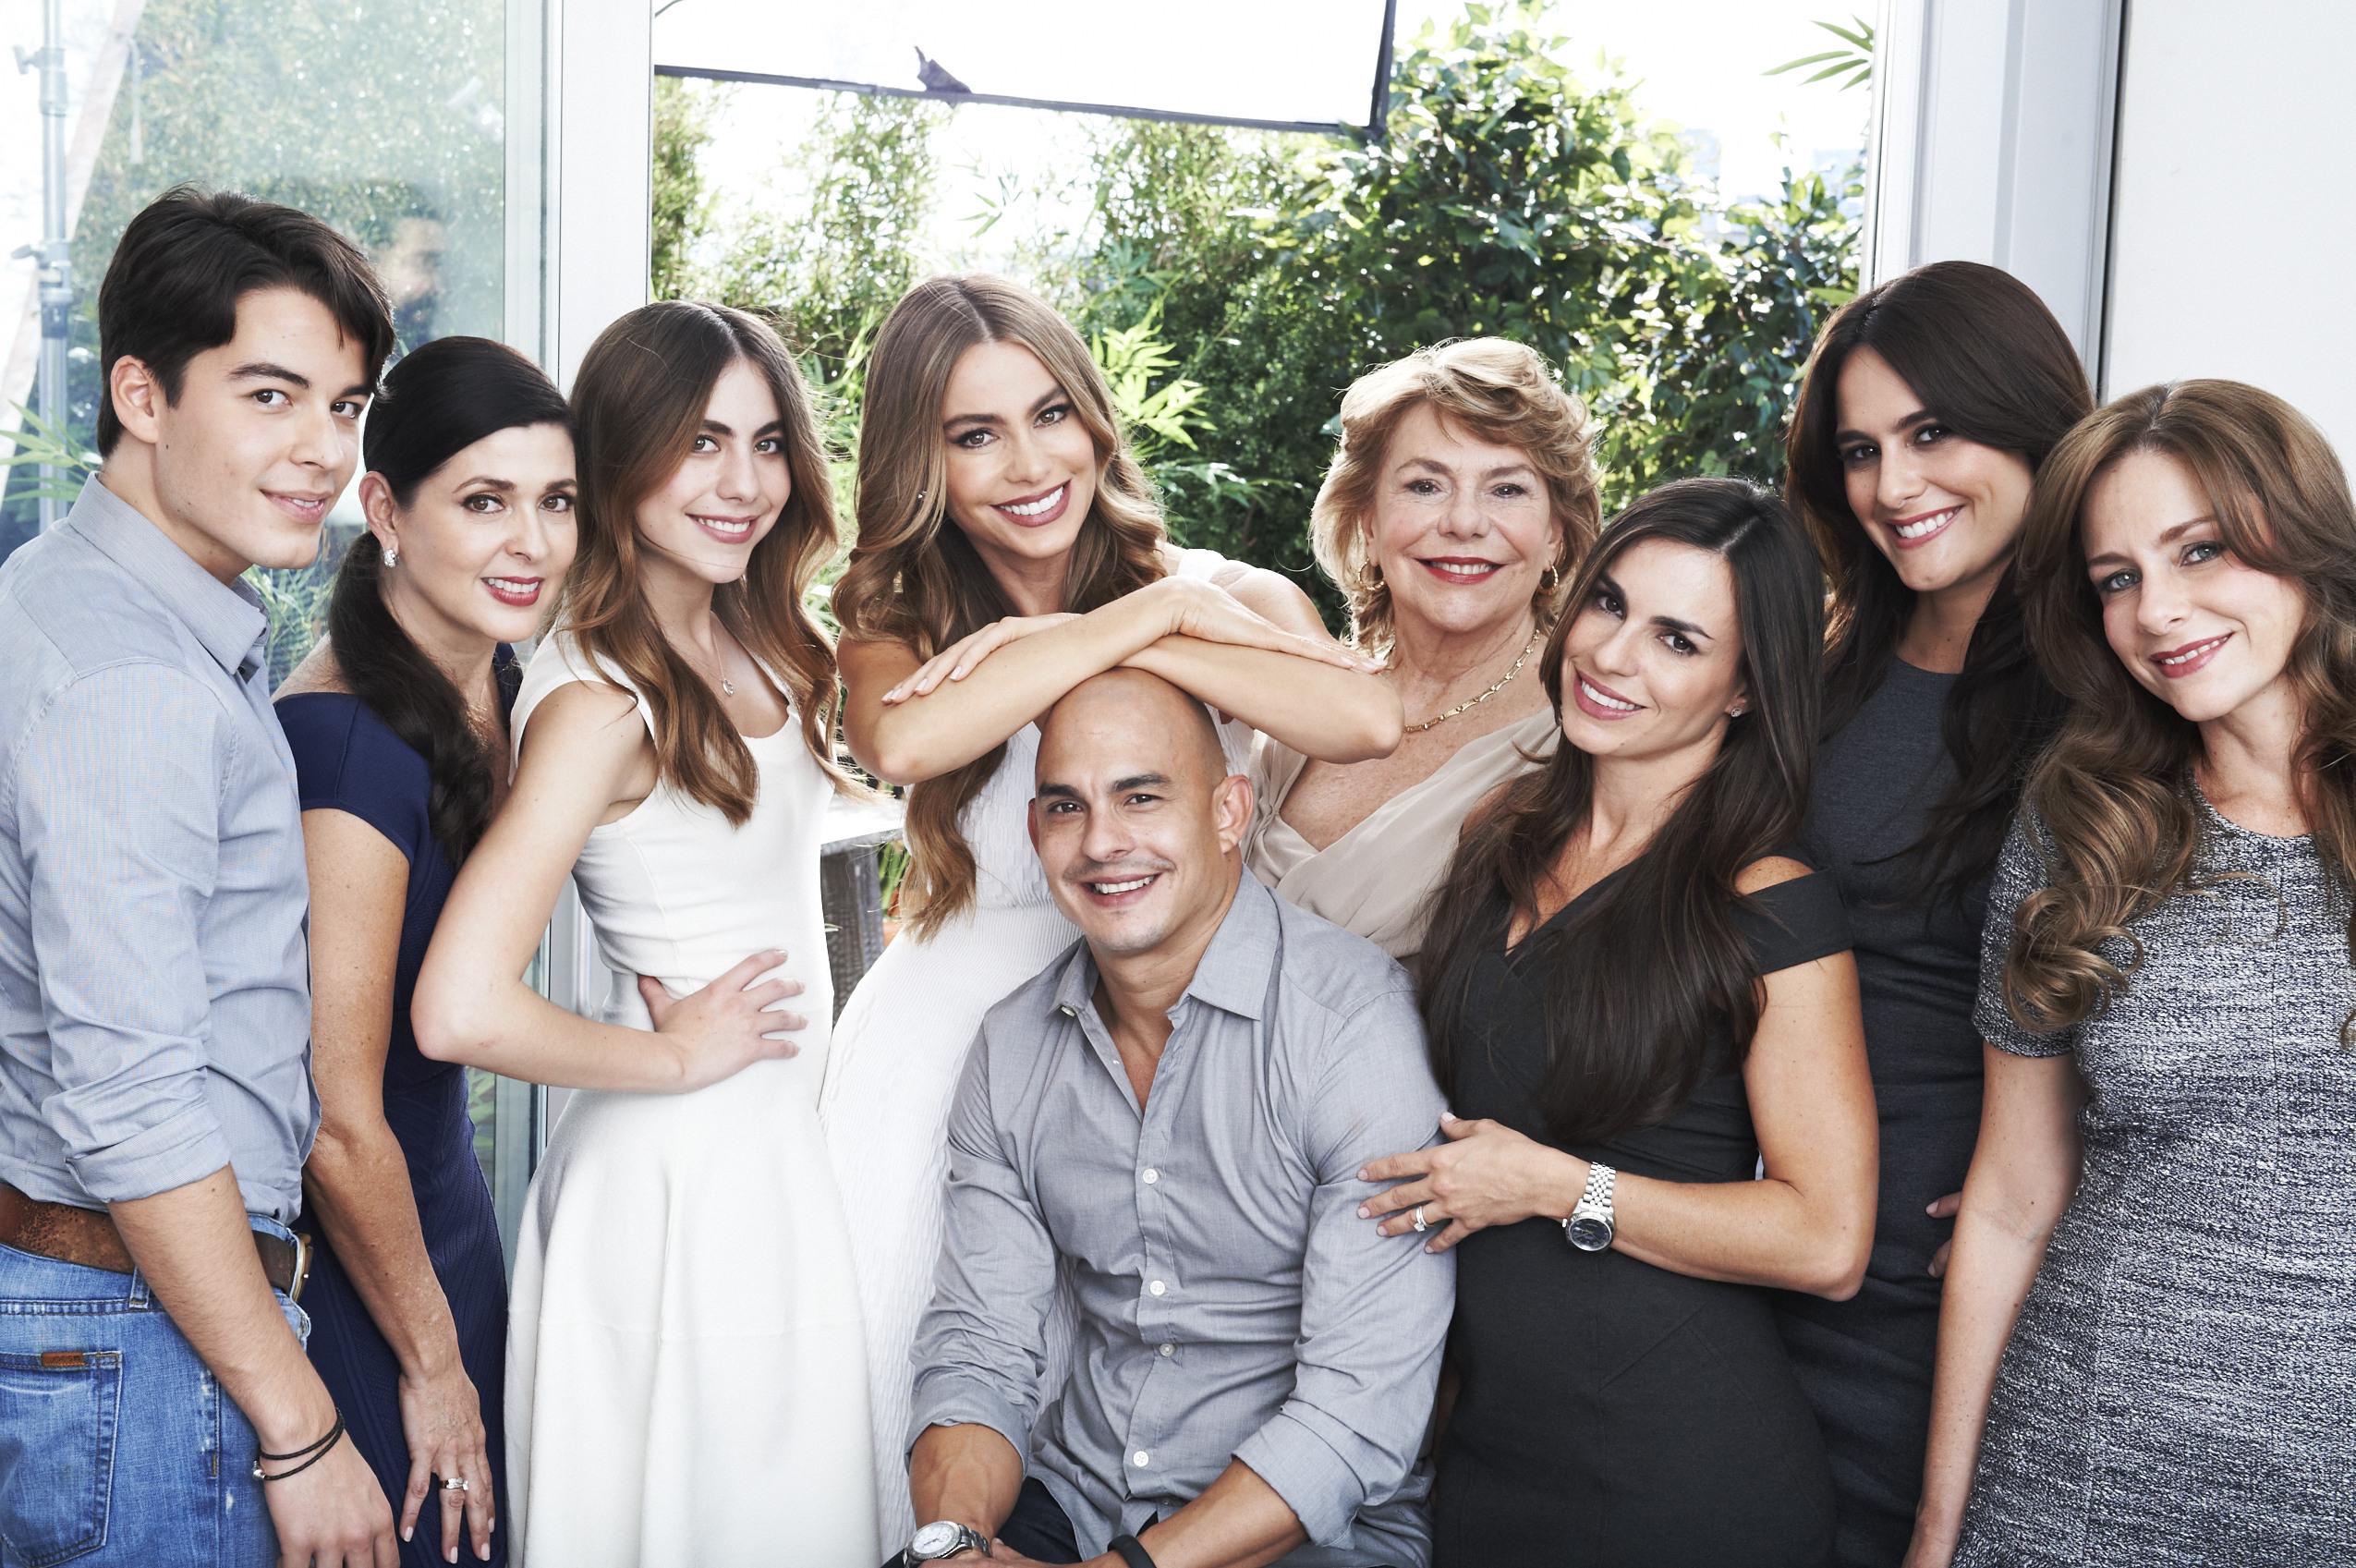 Sofia Vergara Net Worth, Lifestyle, Biography, Wiki, Boyfriend, Family And More